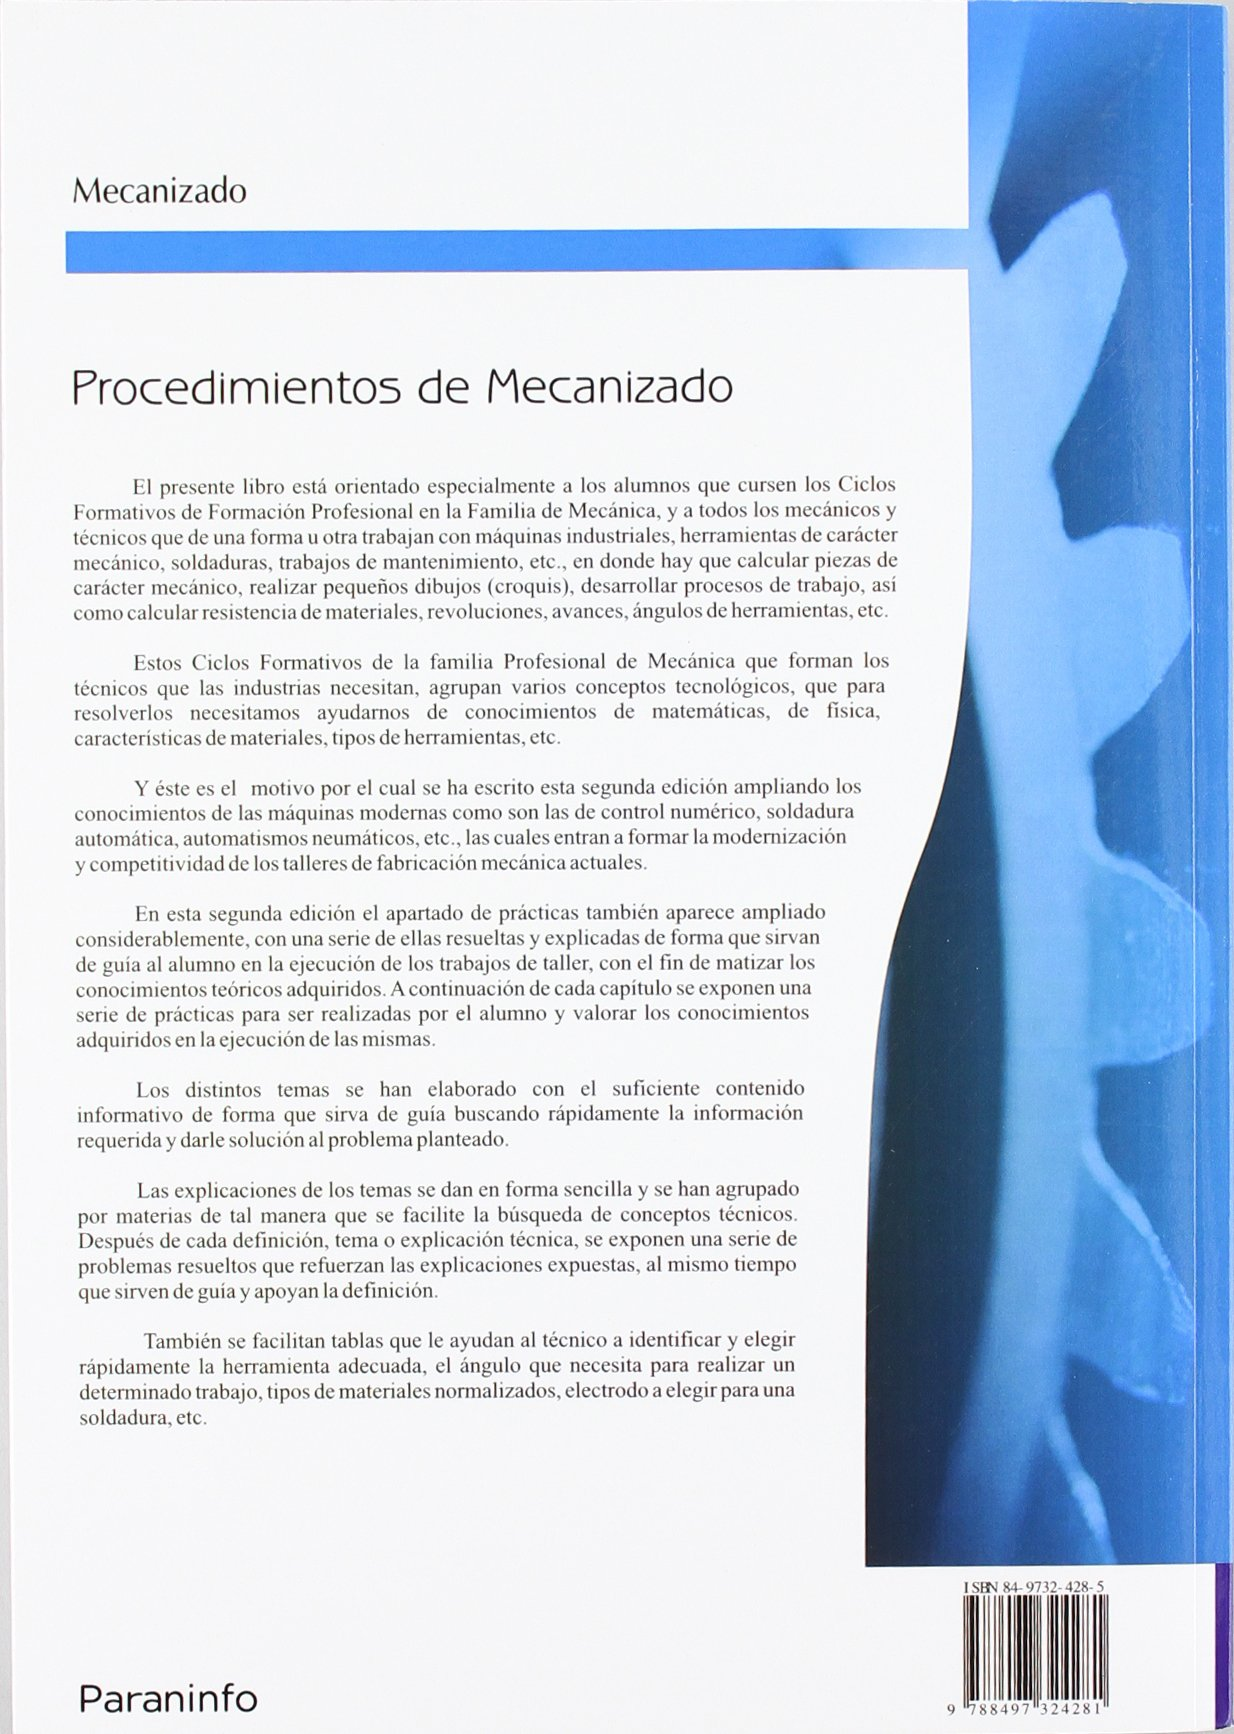 Procedimientos de mecanizado: Simón Millán Gómez: 9788497324281: Amazon.com: Books